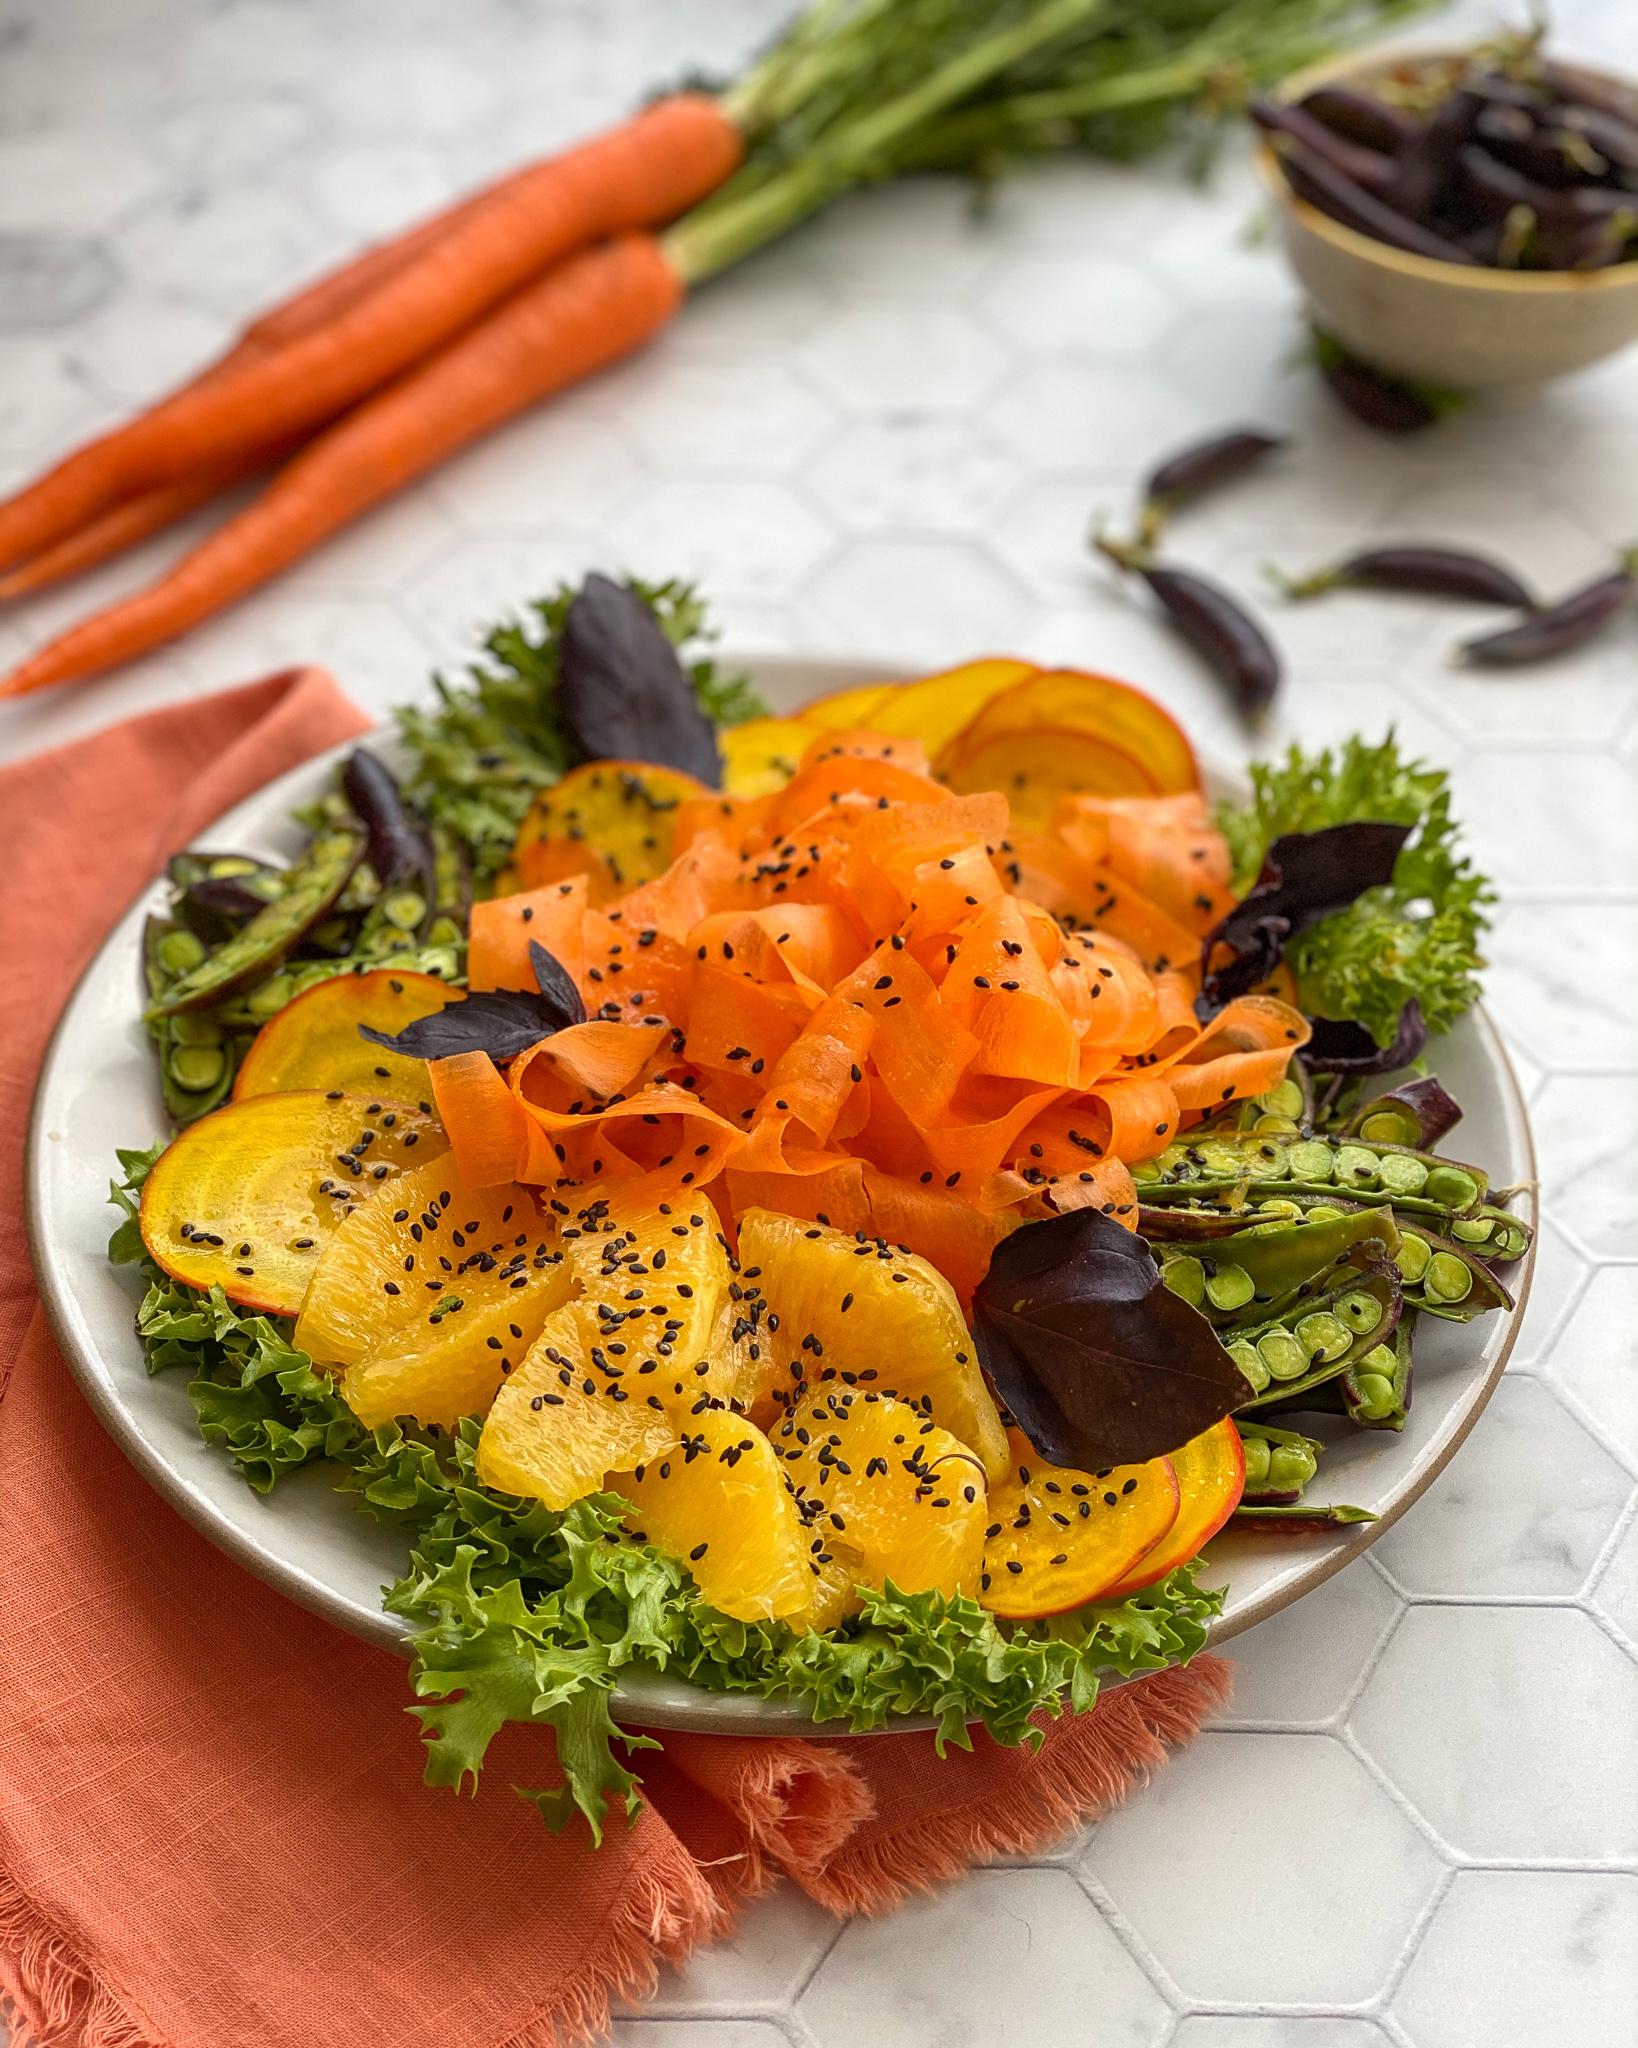 Shaved Beet & Carrot Salad with Orange Miso Vinaigrette